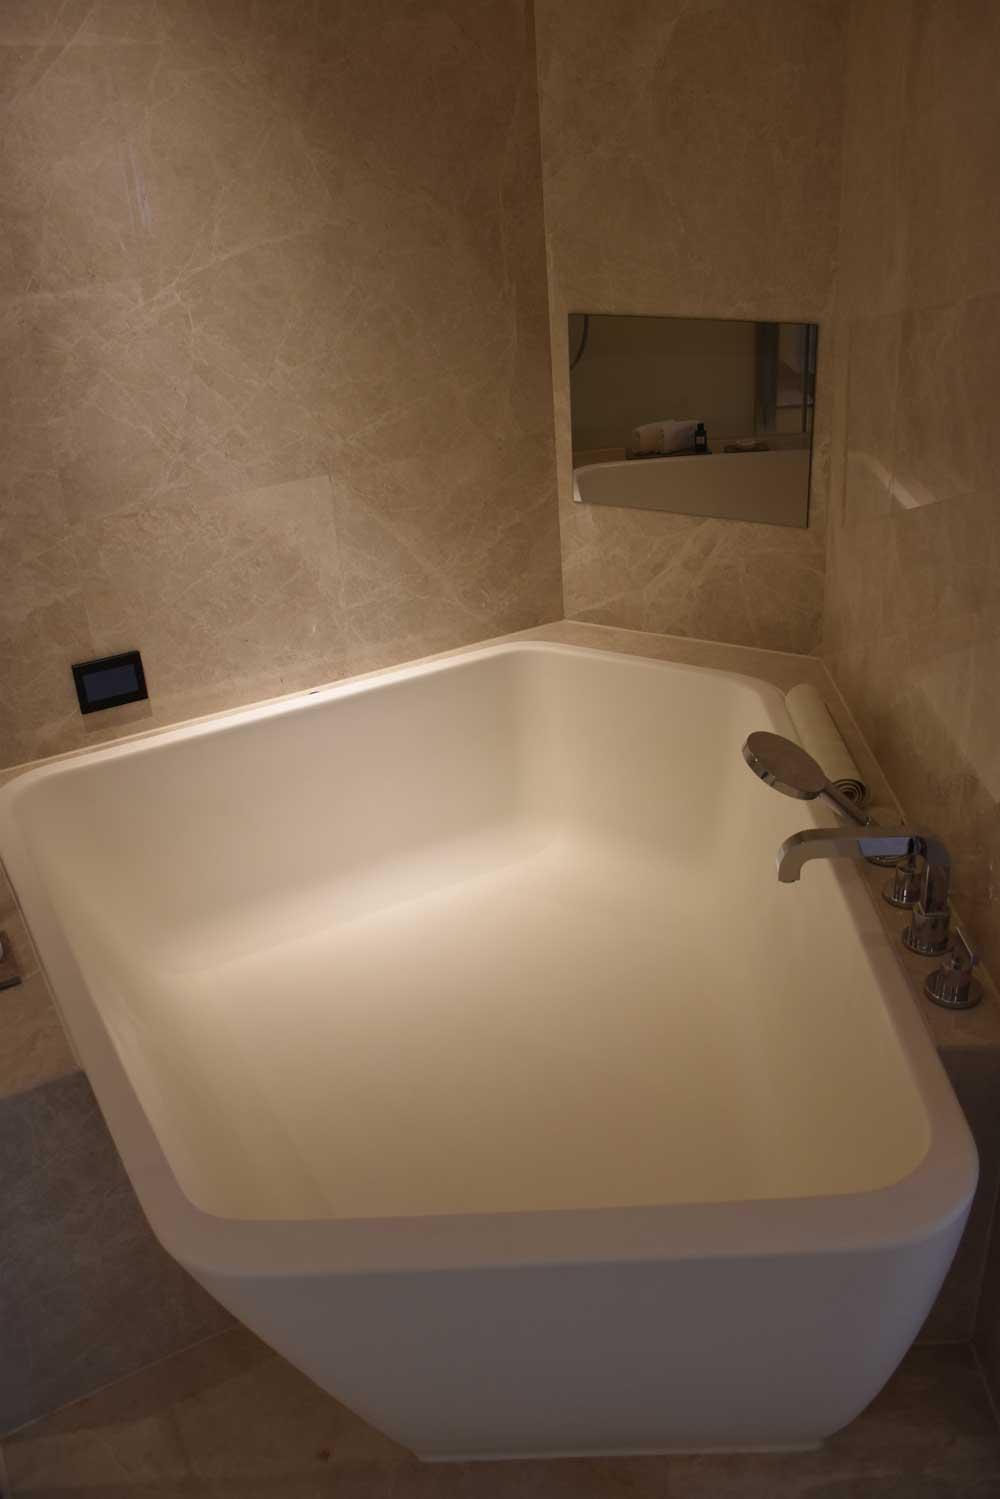 Morpheus Hotel Premier King hot tub